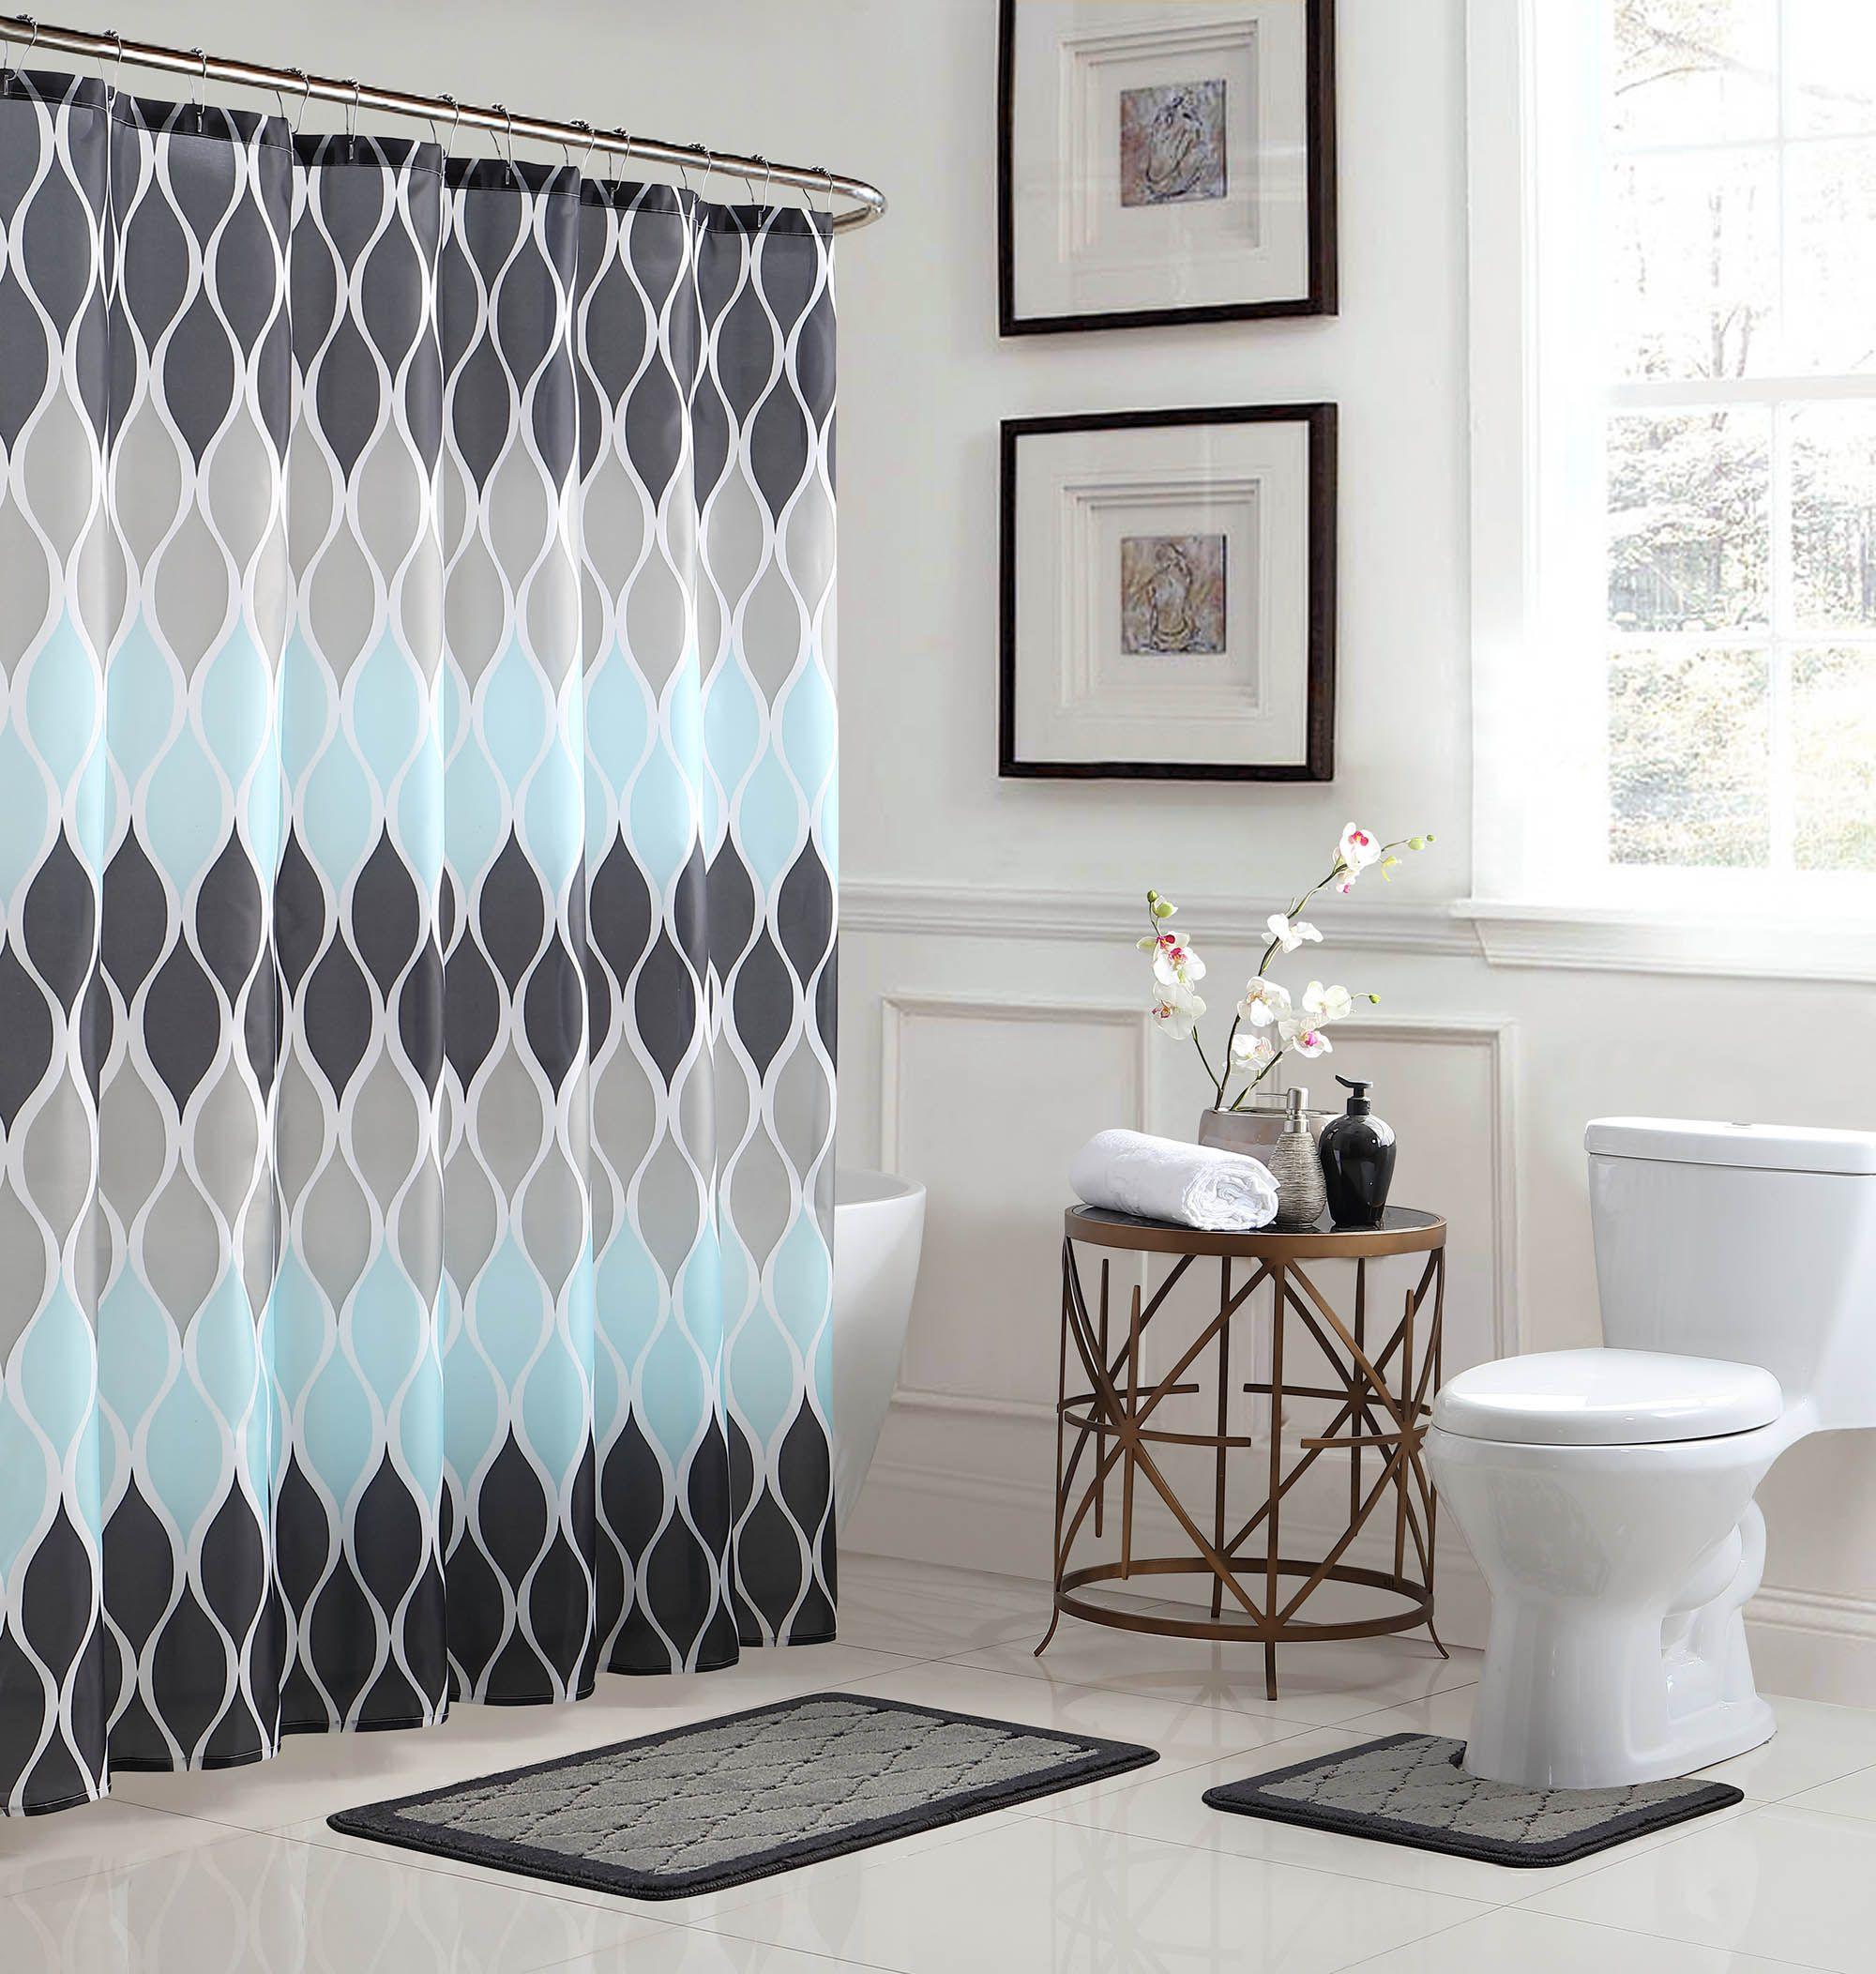 Home Blue Shower Curtains Bathroom Accessories Sets Shower